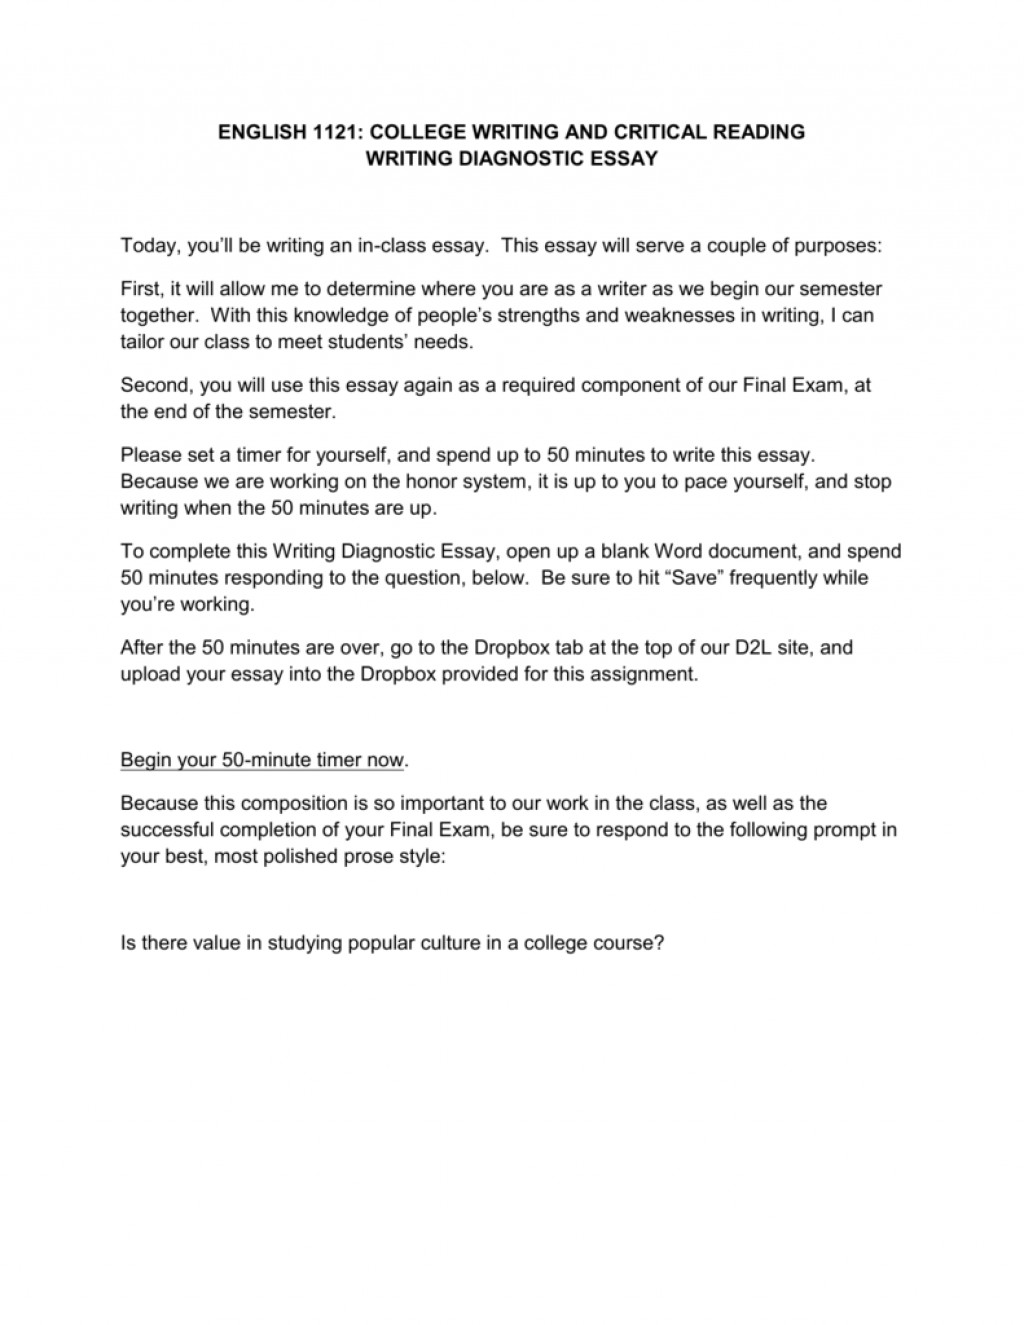 009 Diagnostic Essay 009173466 1 Wondrous Writing Prompts High School Topics Introduction Large